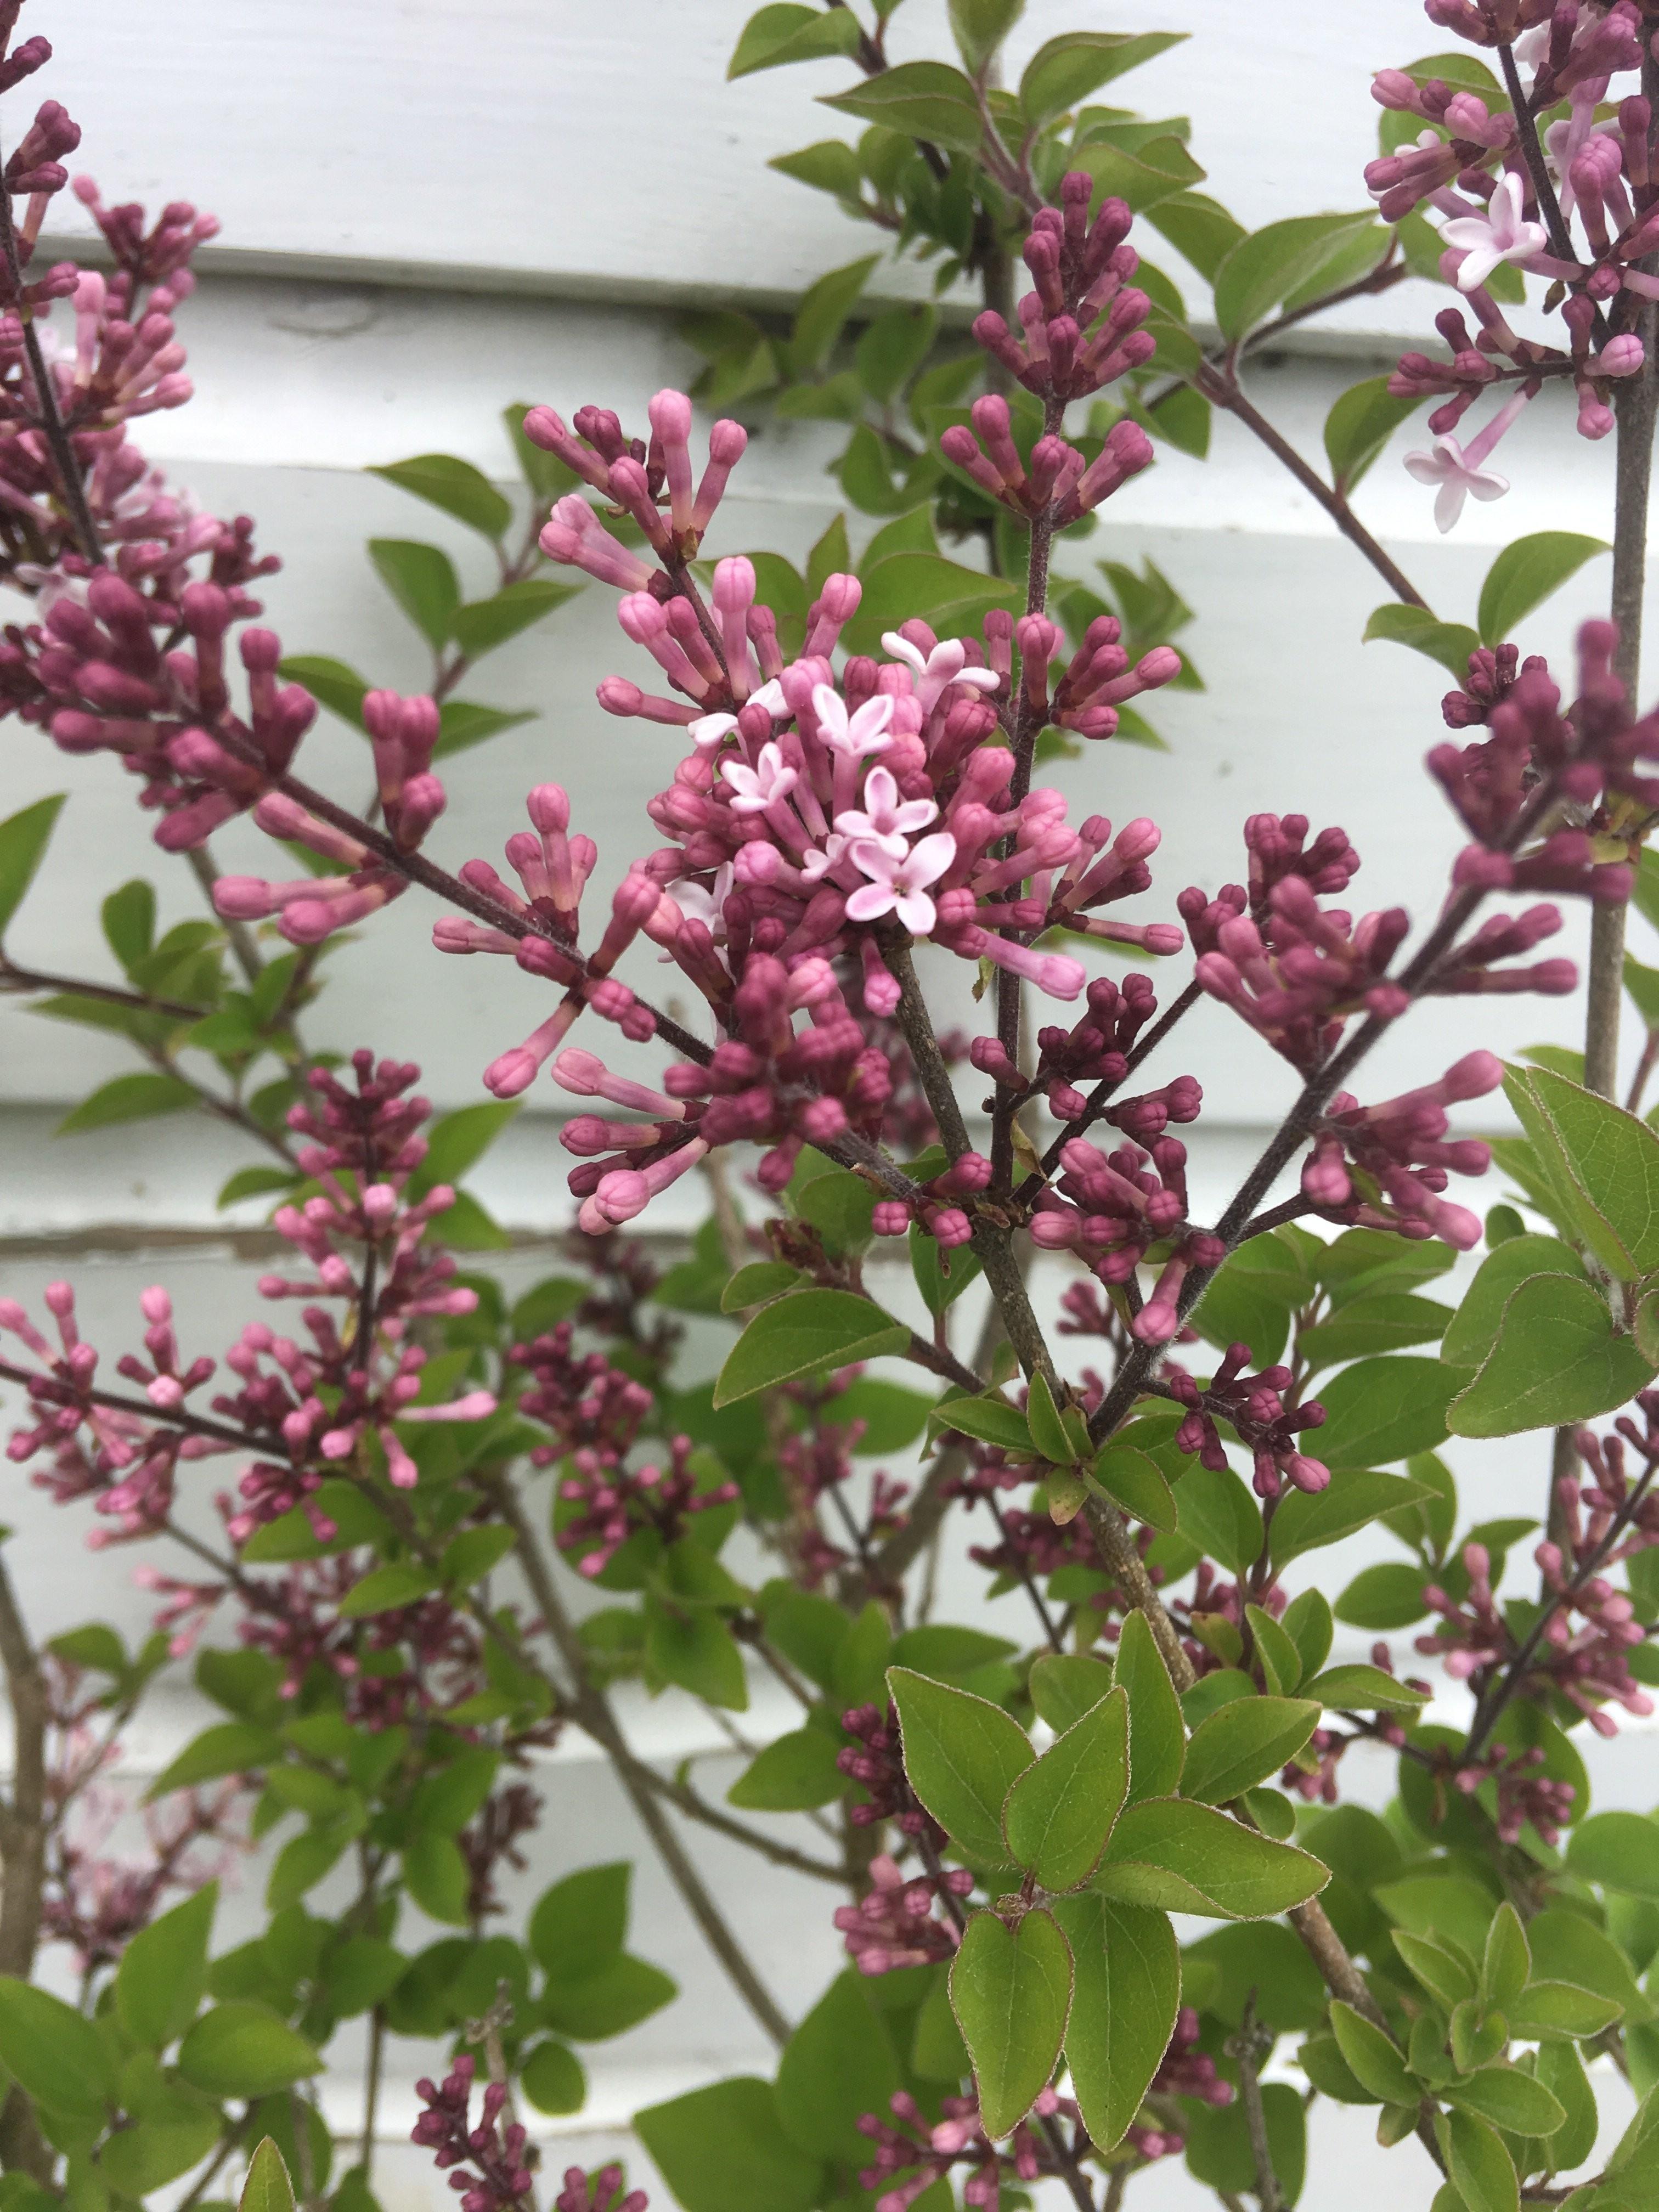 Lilac Flower Meaning Dwarf Korean Lilac Syringa Shrub Pack Of Two